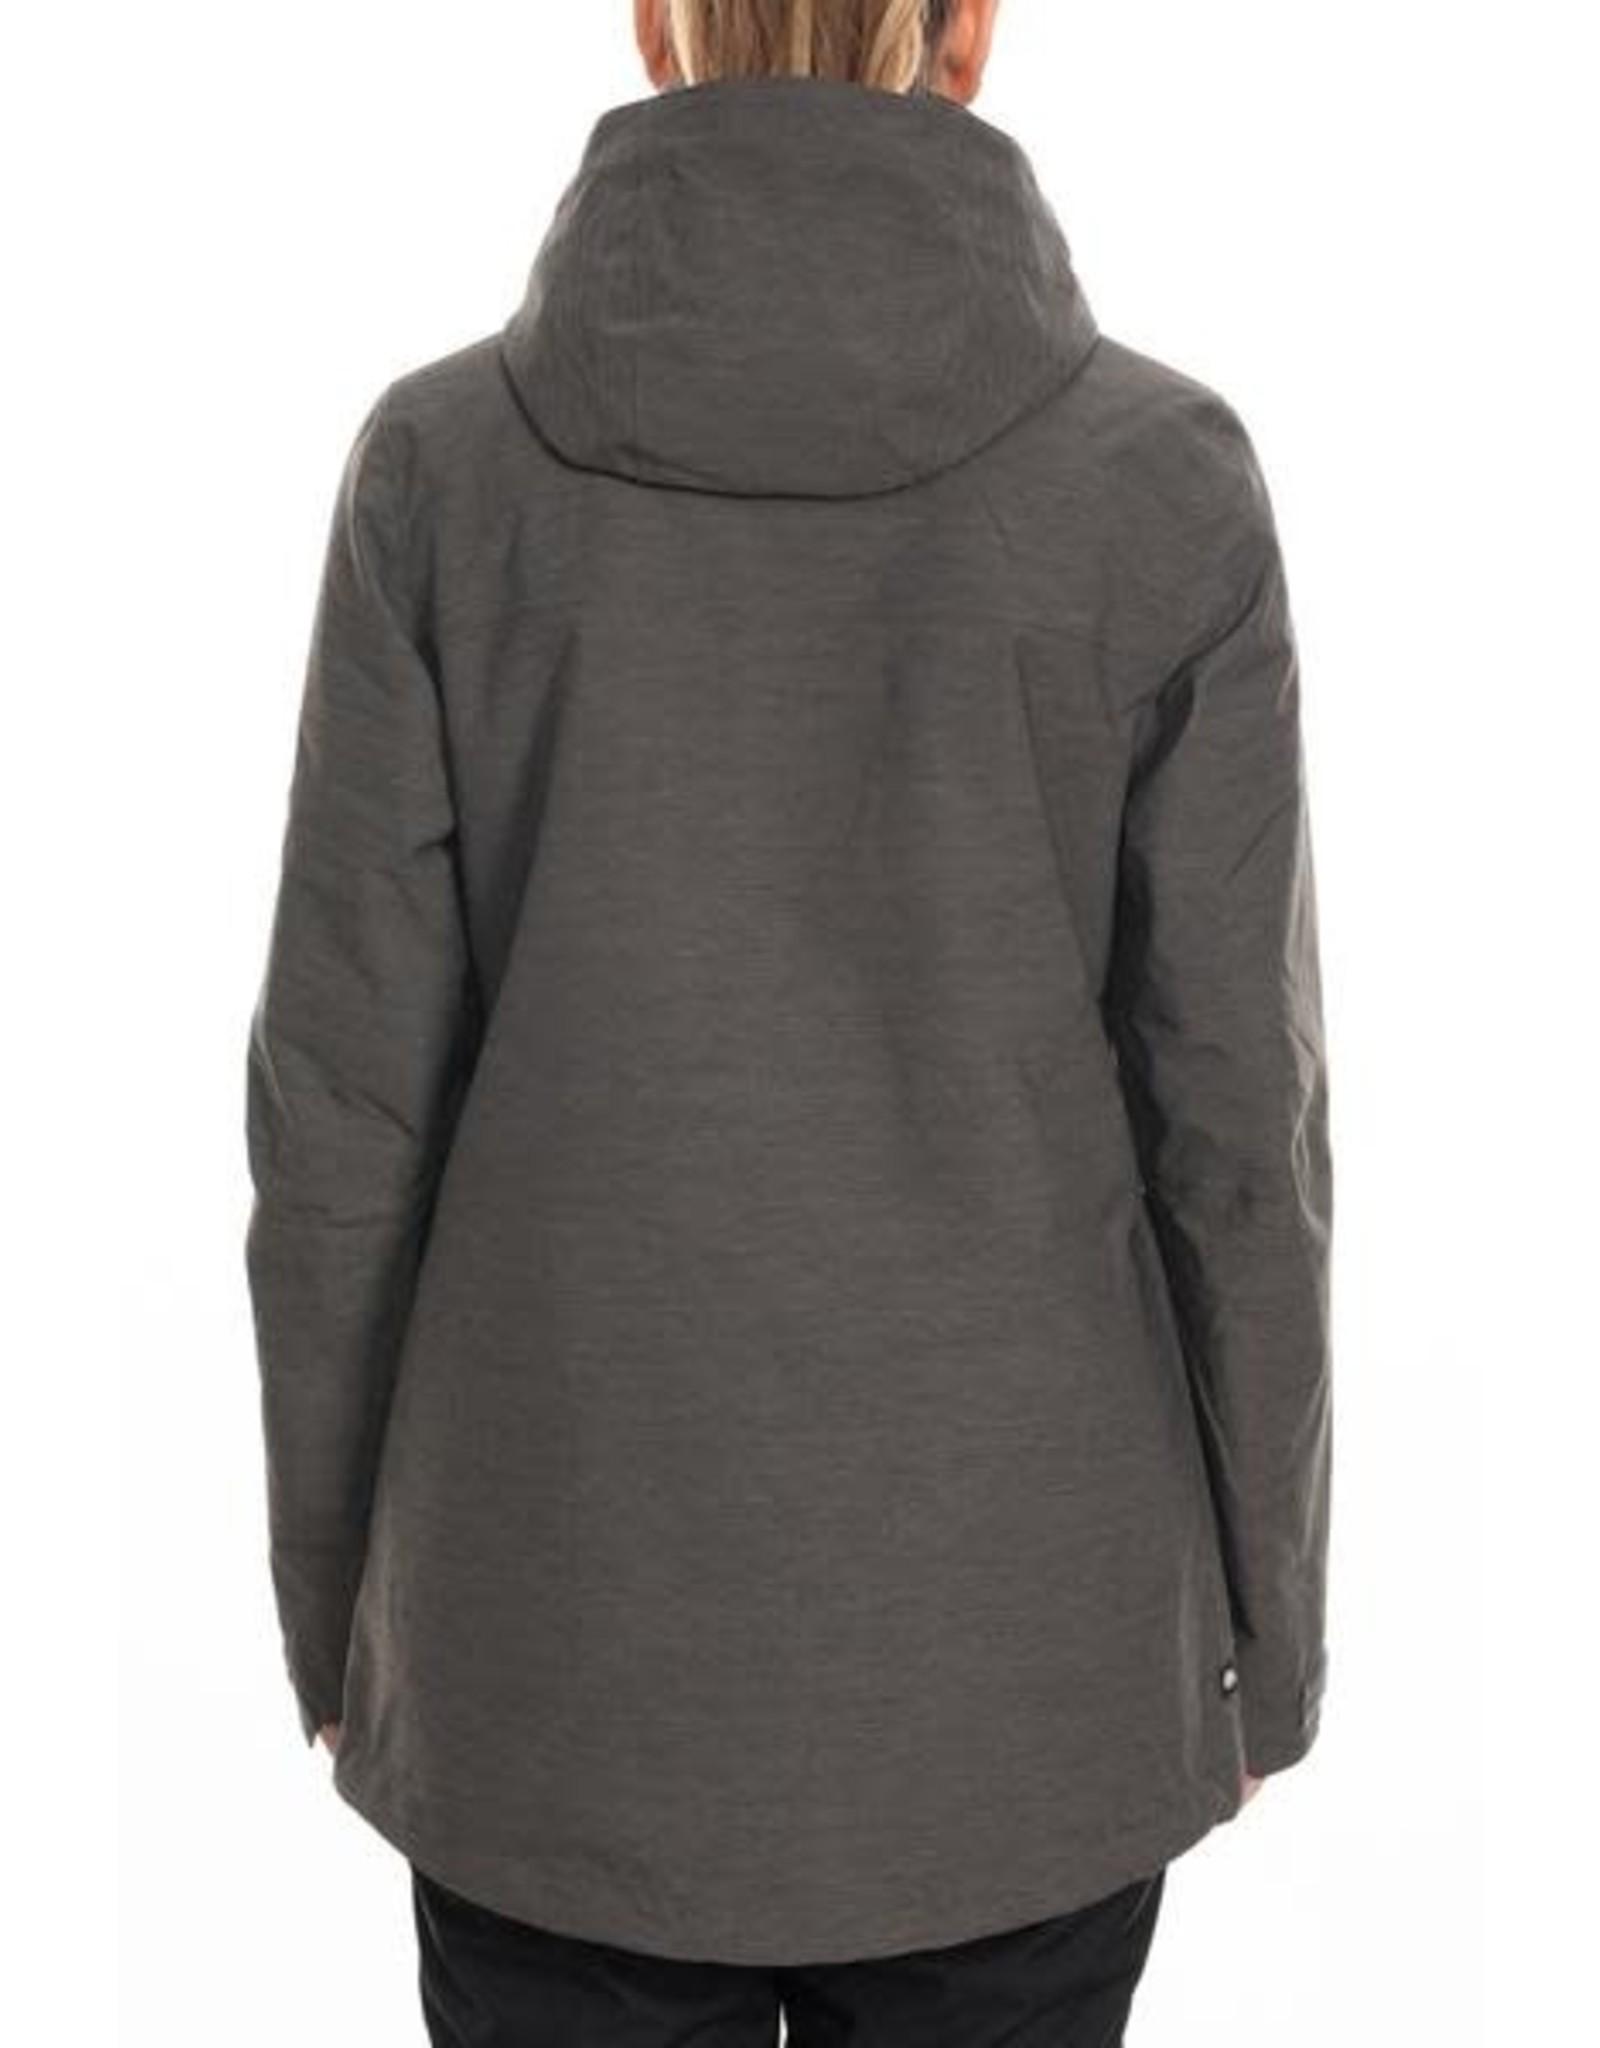 686 686 Women's Smarty 3-IN-1 Spellbound  Jacket